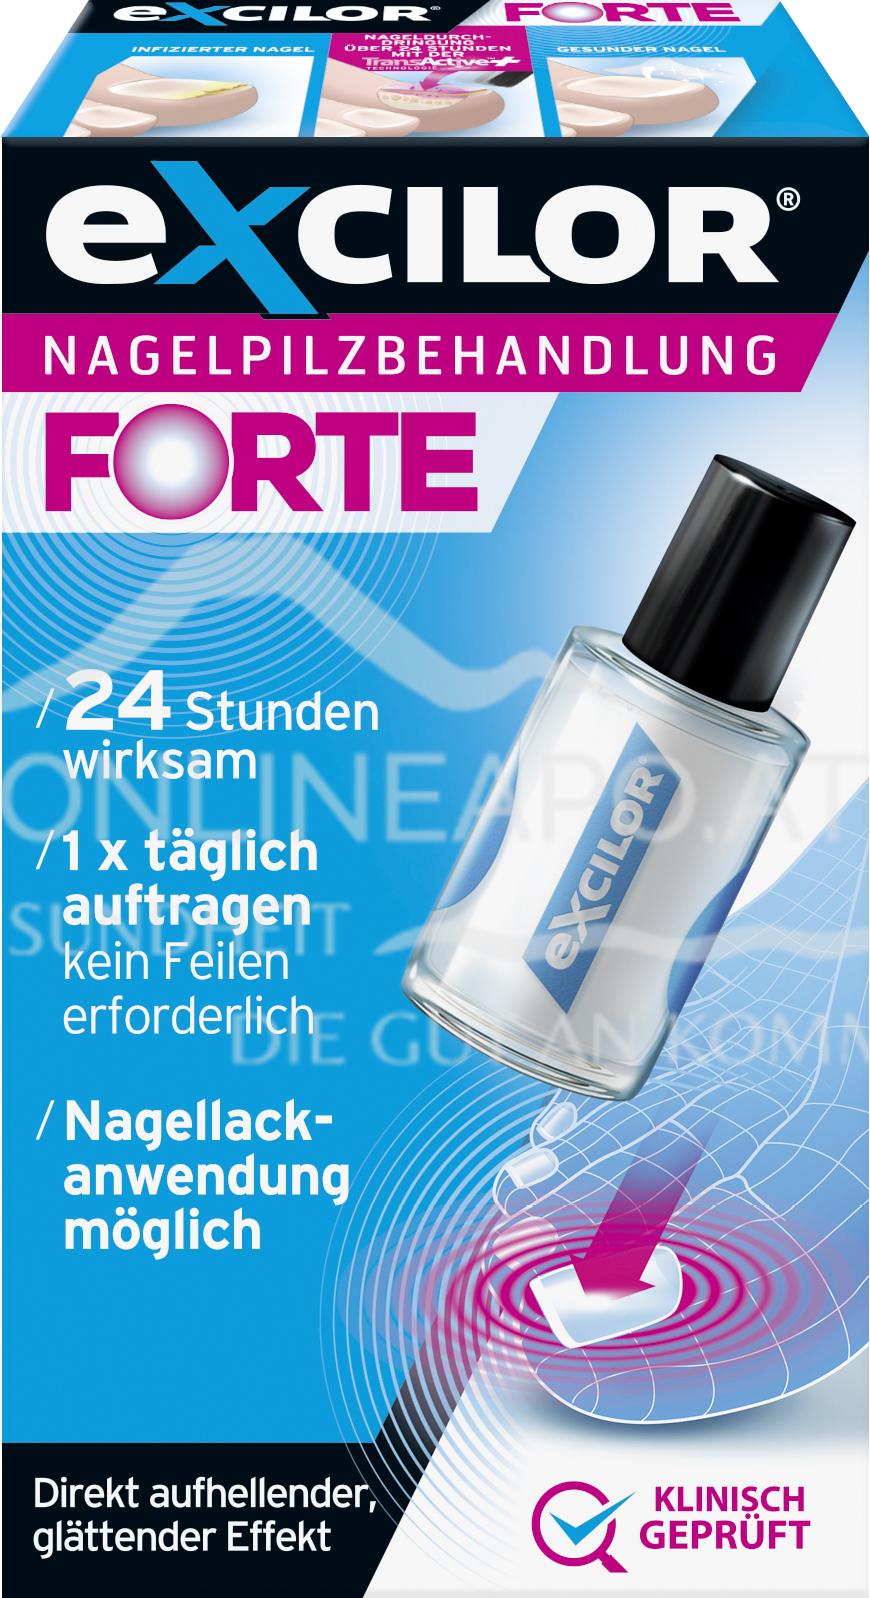 Excilor® Nagelpilzbehandlung Forte